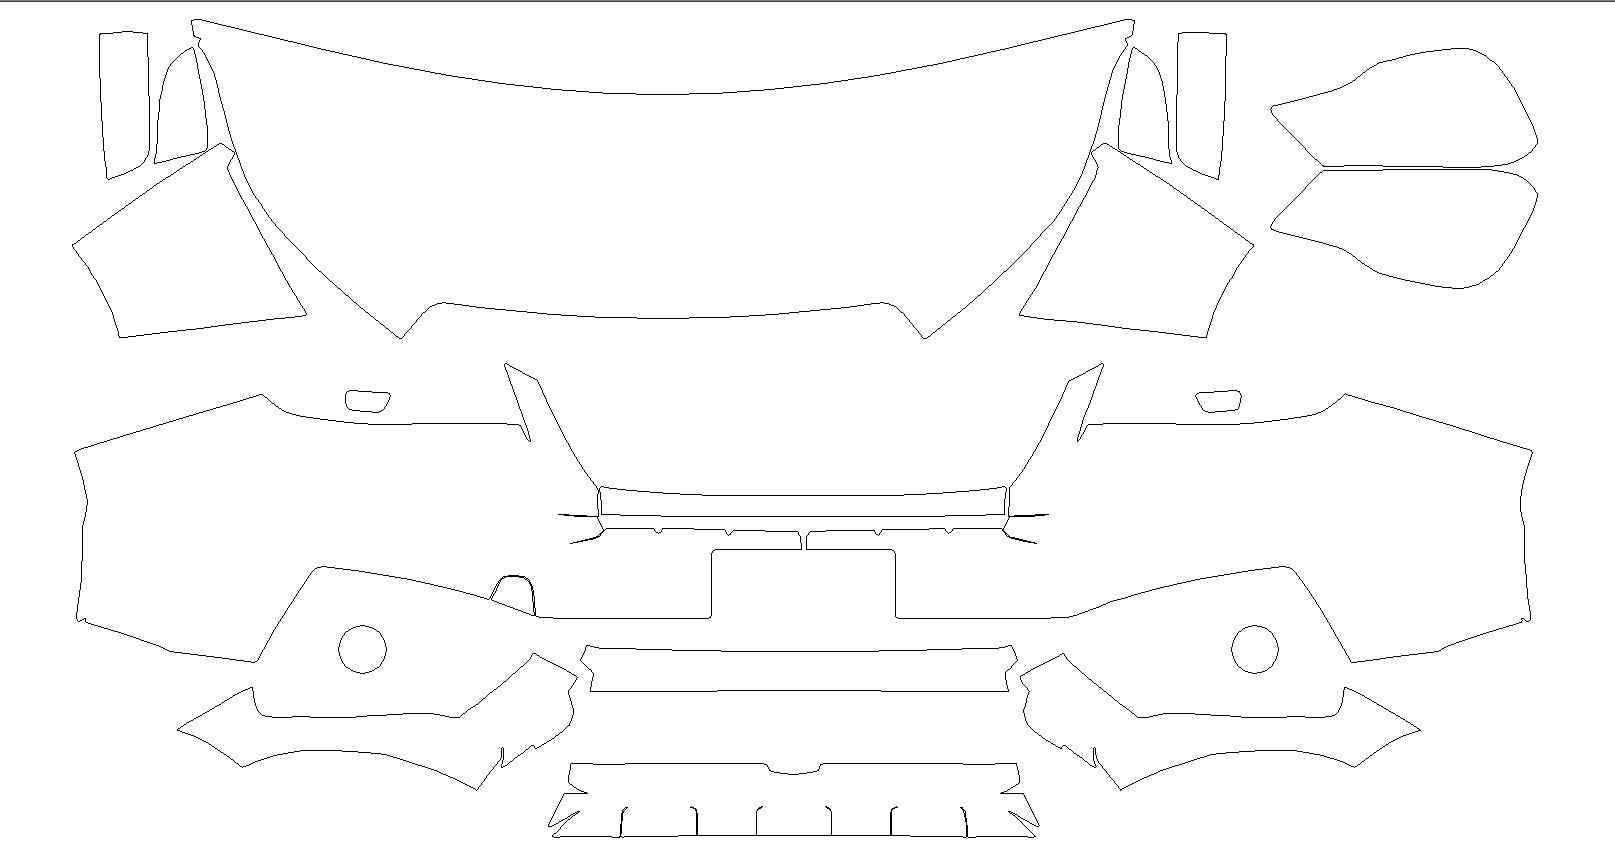 В продаже и в работе лекало на Subaru Forester 2016 г.